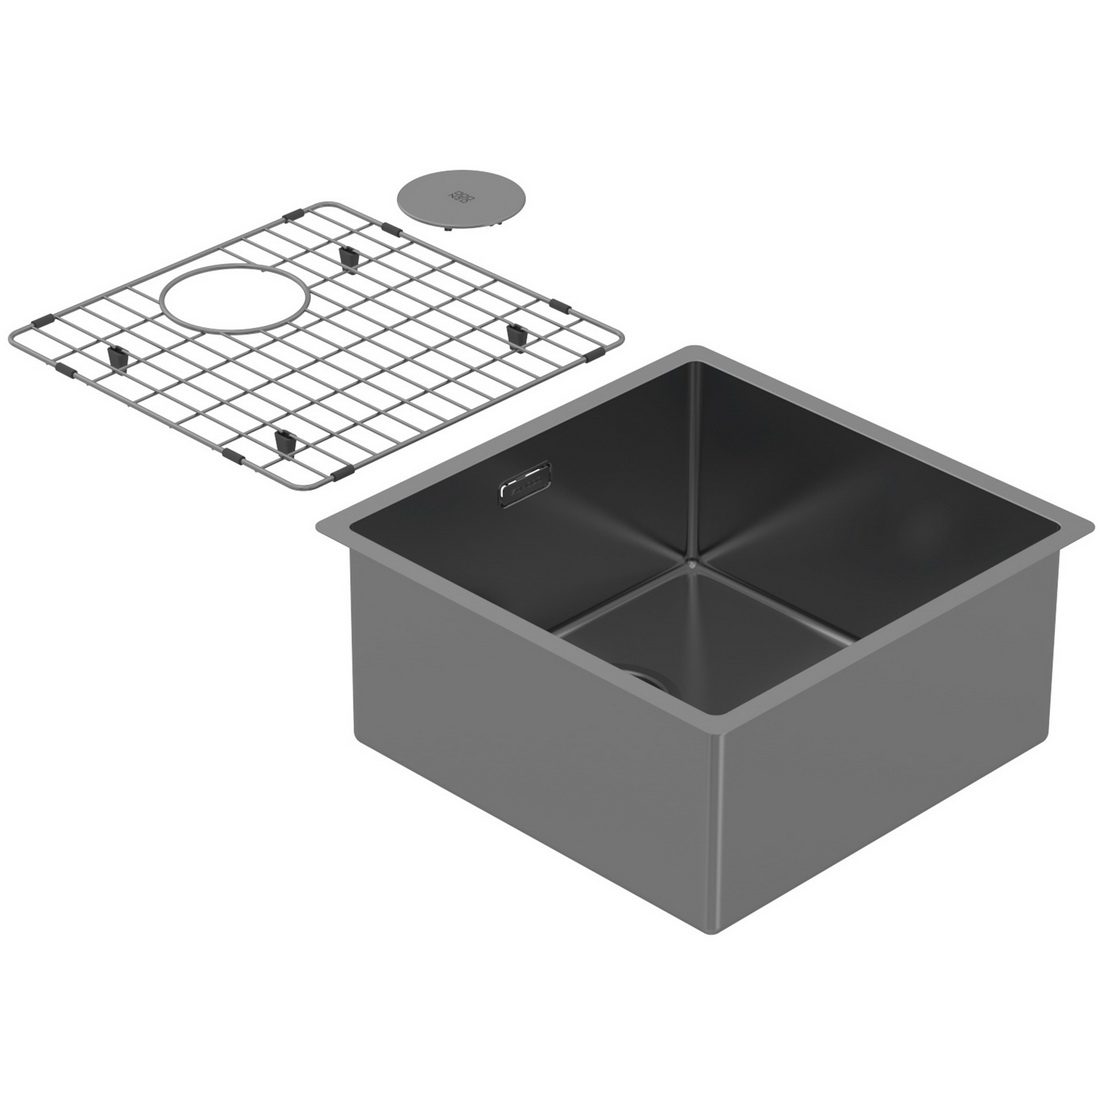 440x440x200mm Single Medium Bowl Undermount Kitchen Sink Cayman Sonic Grey PearlArc Finish